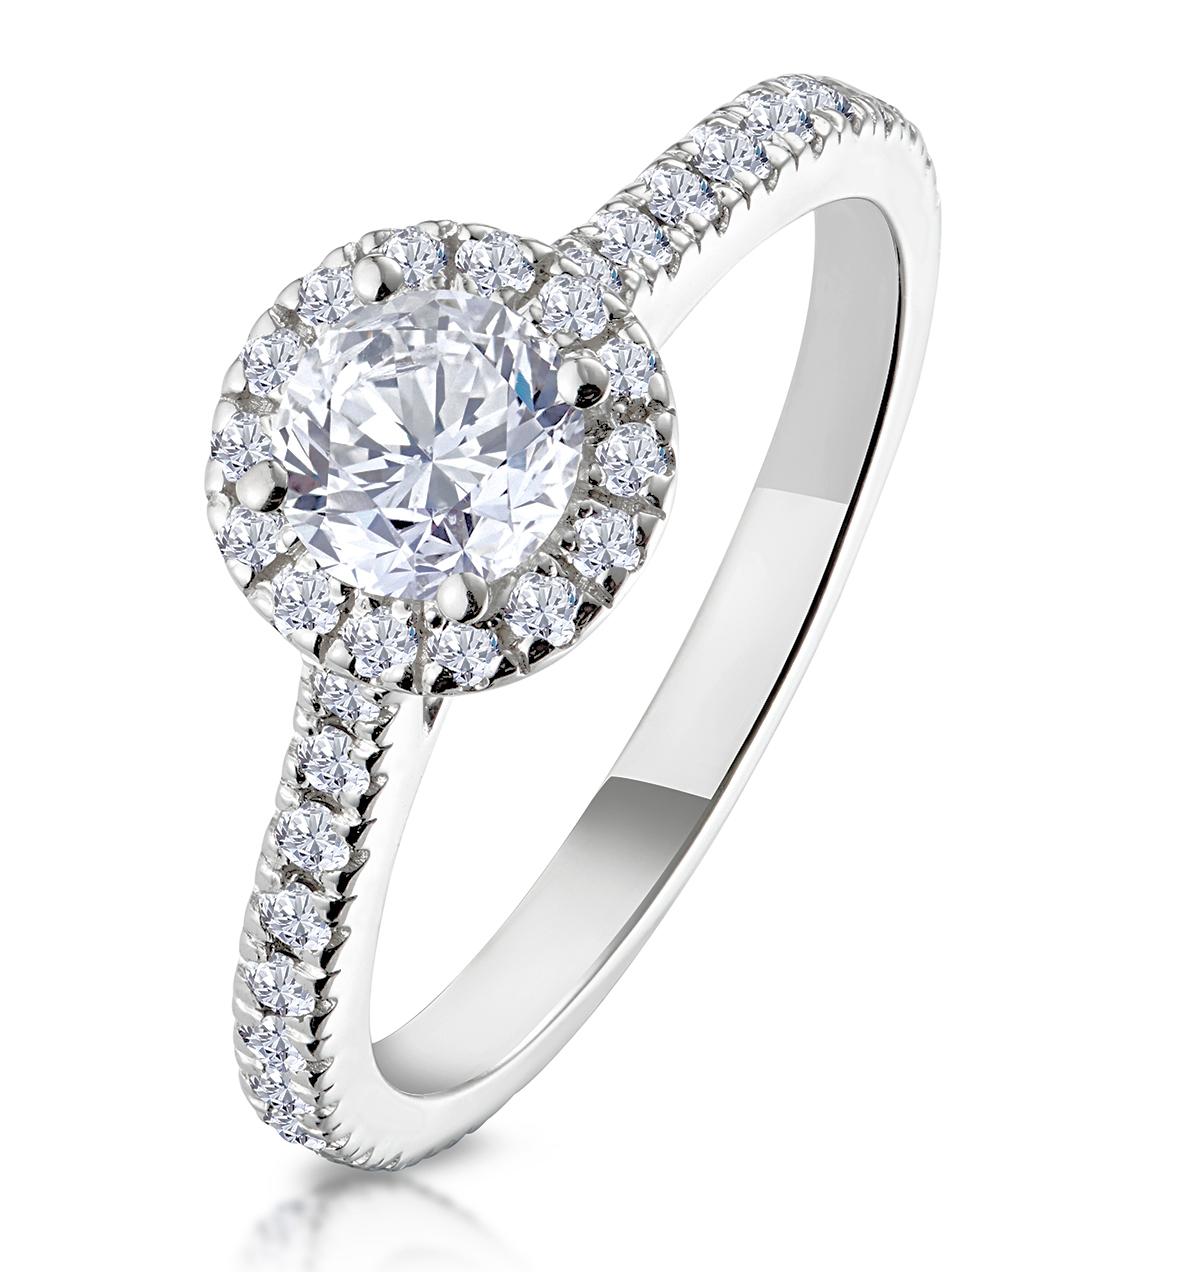 Reina GIA Diamond Halo Engagement Ring in 18K White Gold 1.10ct G/VS1 - image 1